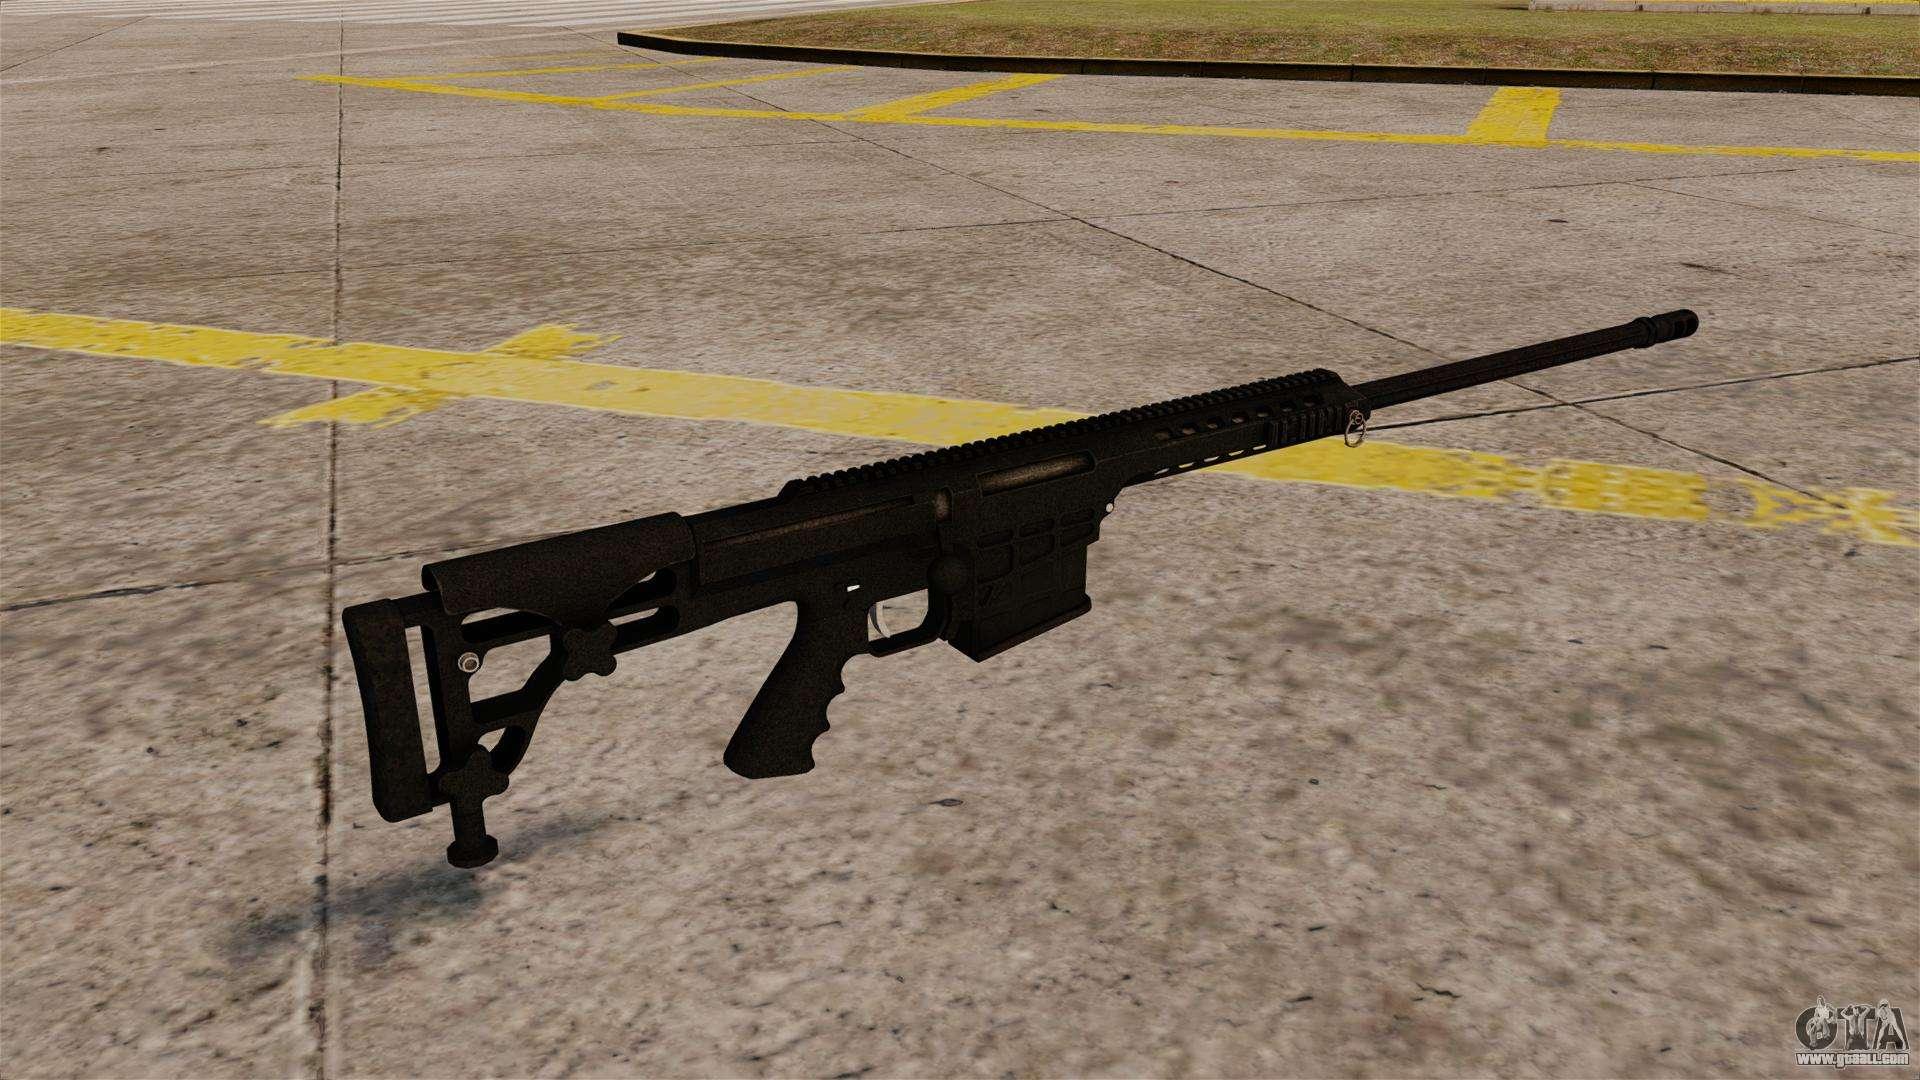 m98b sniper rifle - photo #20